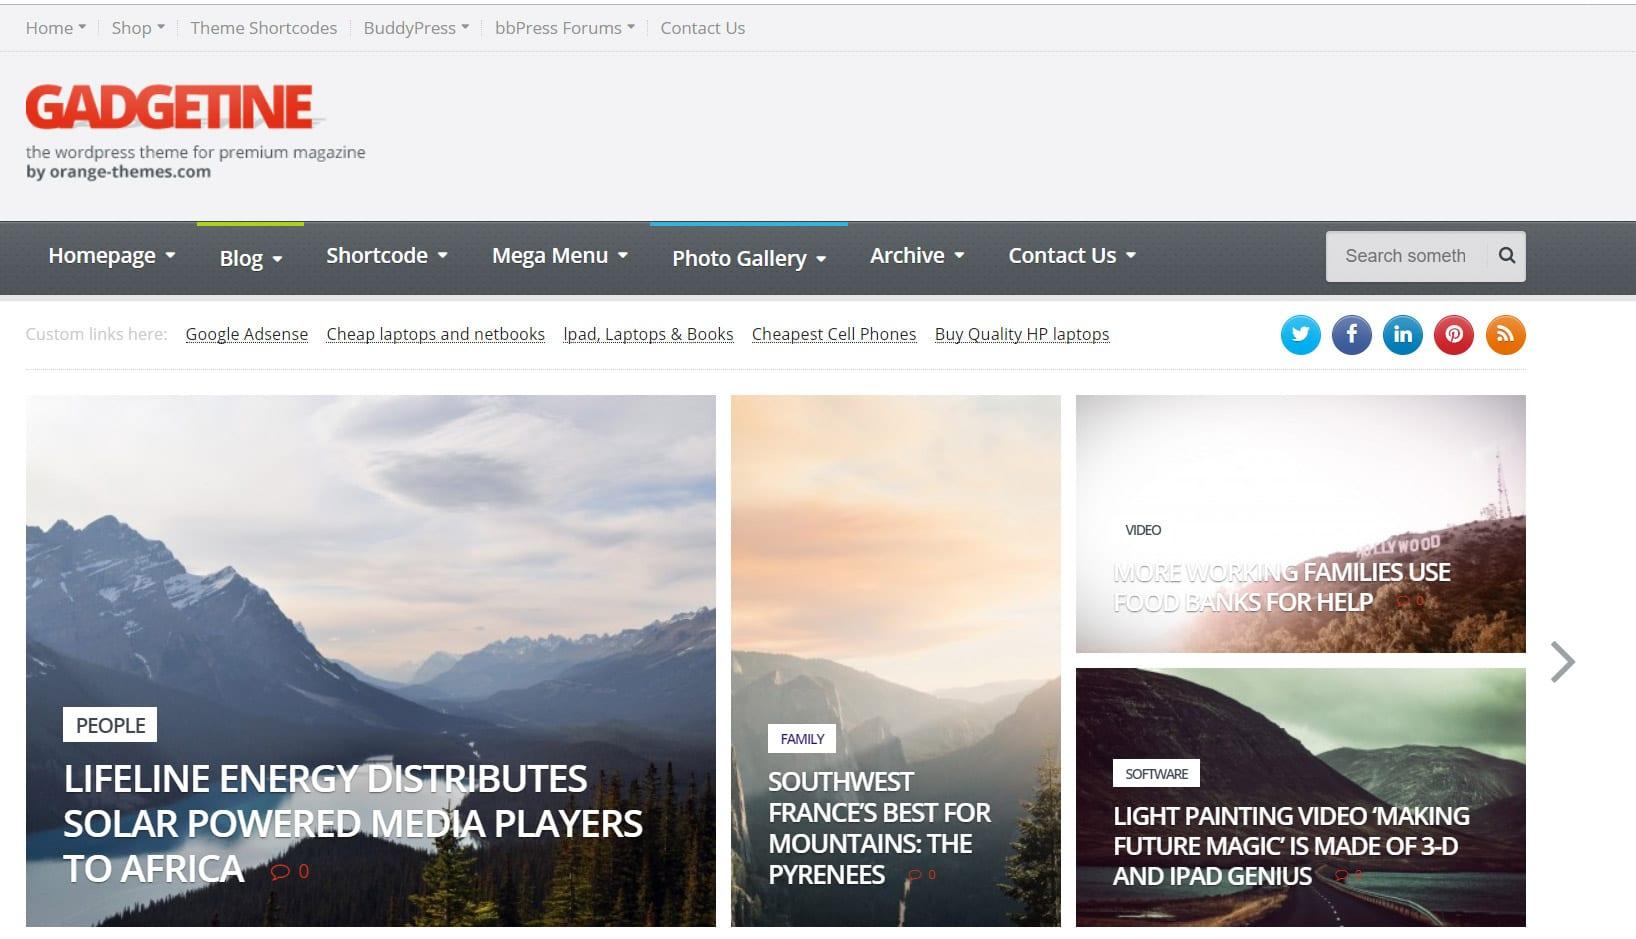 Gadgetine Theme Magazine WordPress